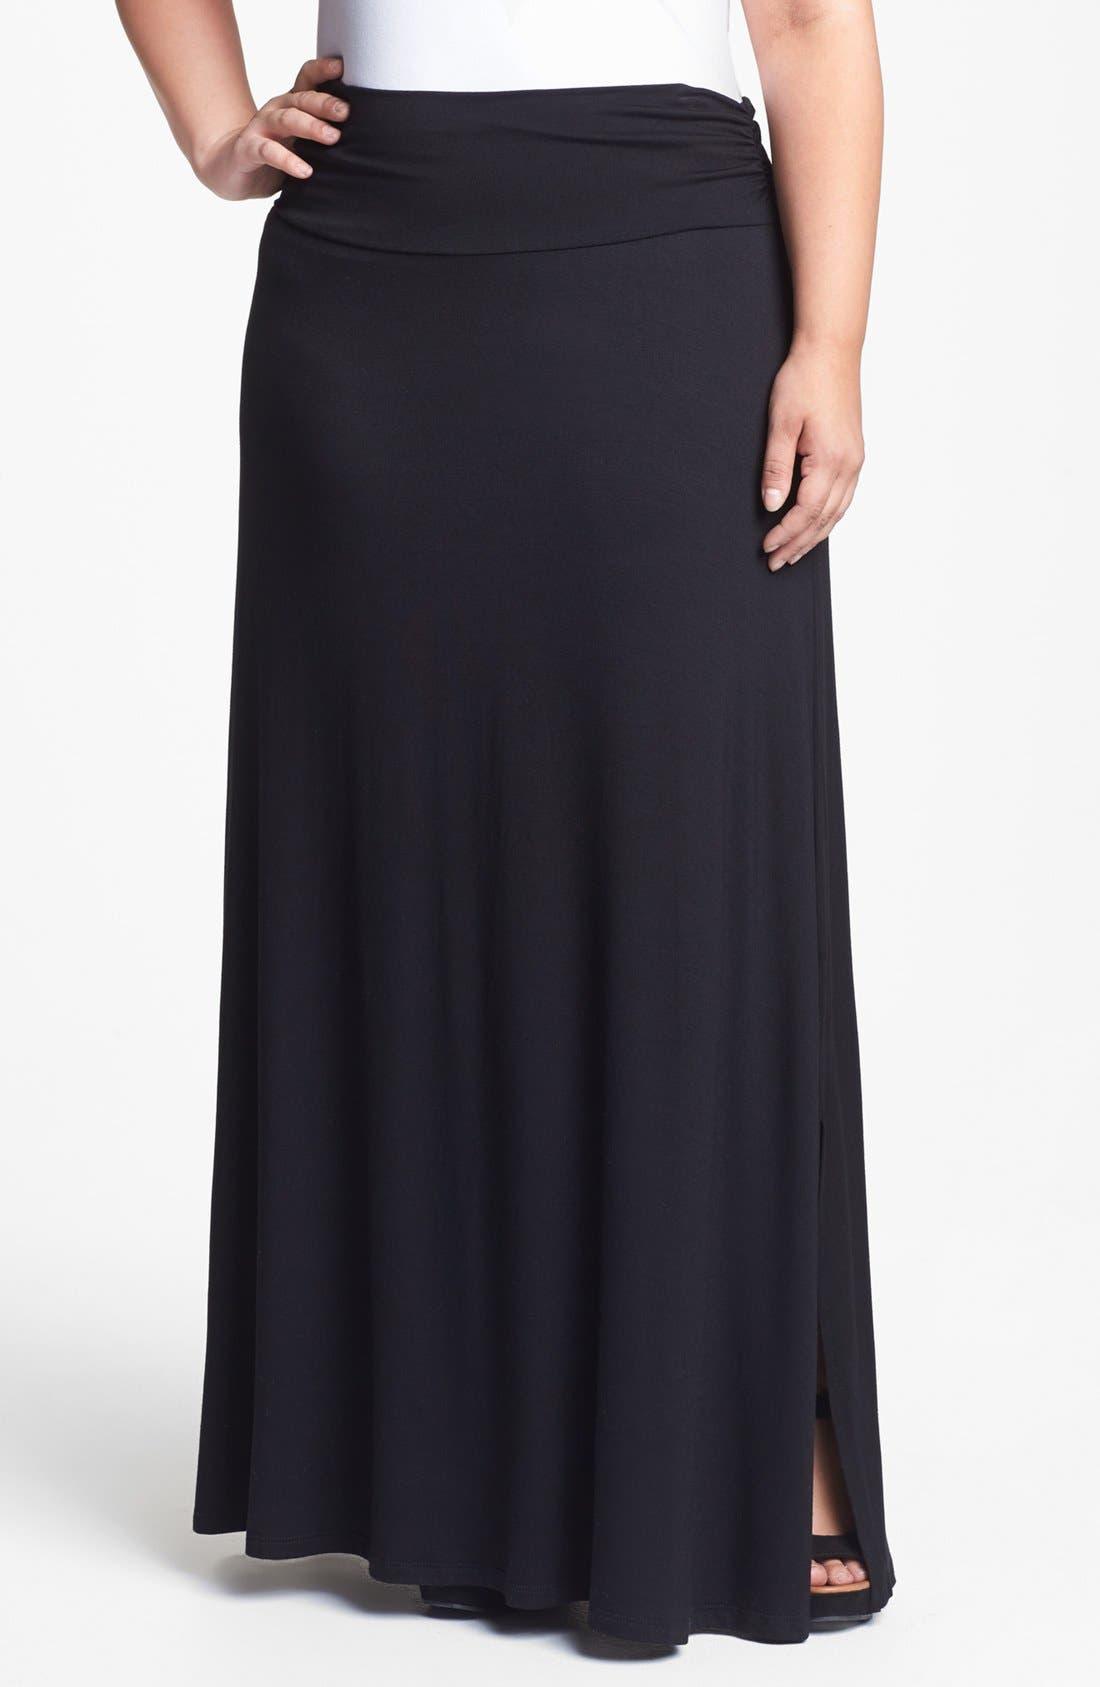 Alternate Image 1 Selected - Bobeau Knit Maxi Skirt (Plus Size)